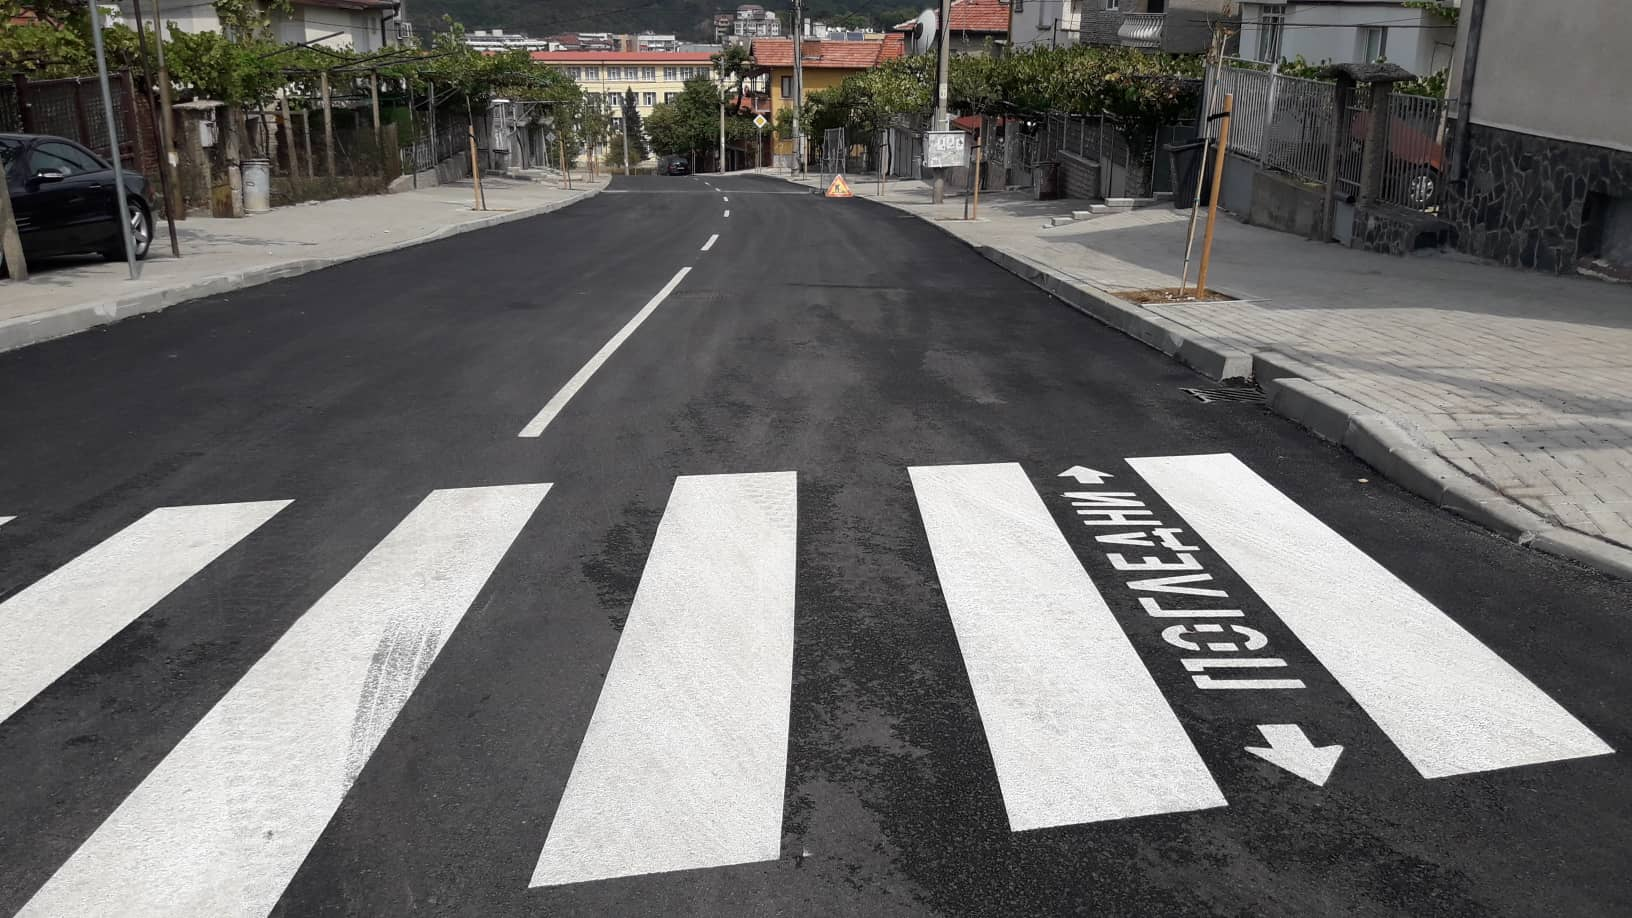 Ул.Велико Търново посреща шофьори и пешеходци с нов асфалт, тротоари и маркировка.